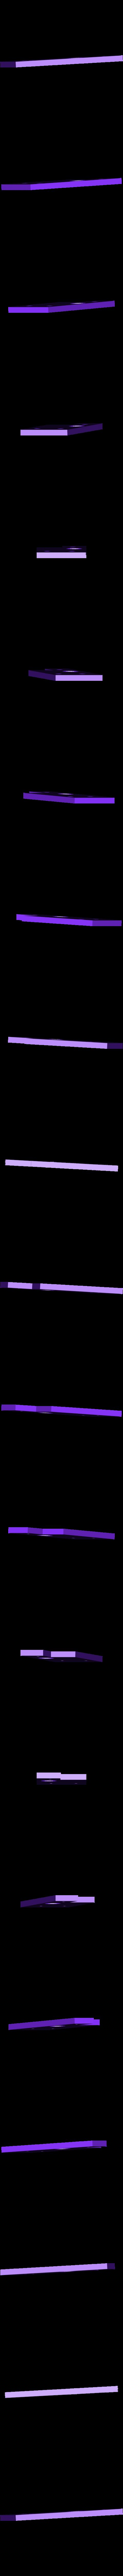 Right side inner cover.stl Télécharger fichier STL gratuit Hogwarts School of Witchcraft • Plan à imprimer en 3D, Valient